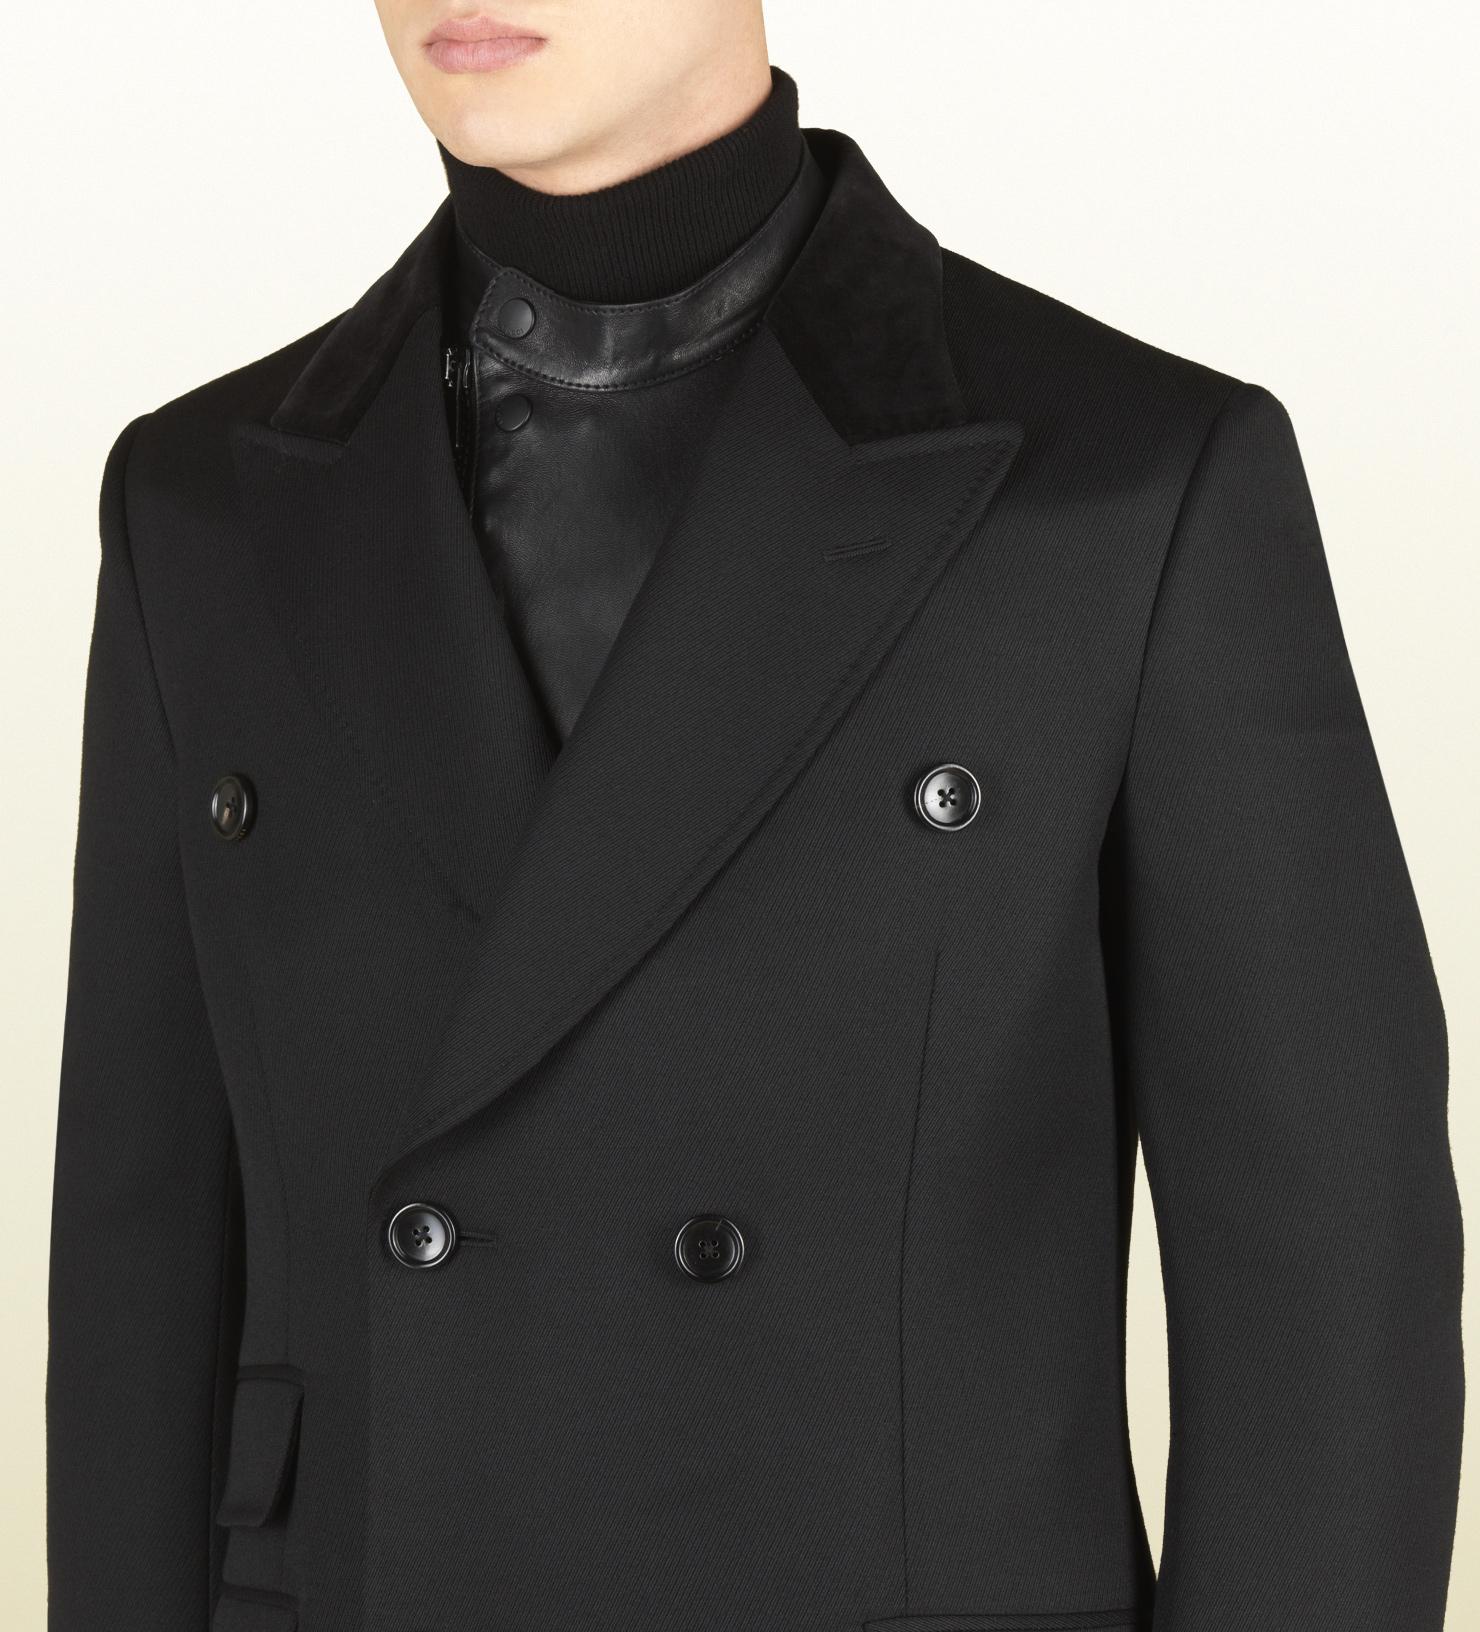 e2330ac354ea9 Lyst - Gucci Black Wool Equestrian Coat in Black for Men